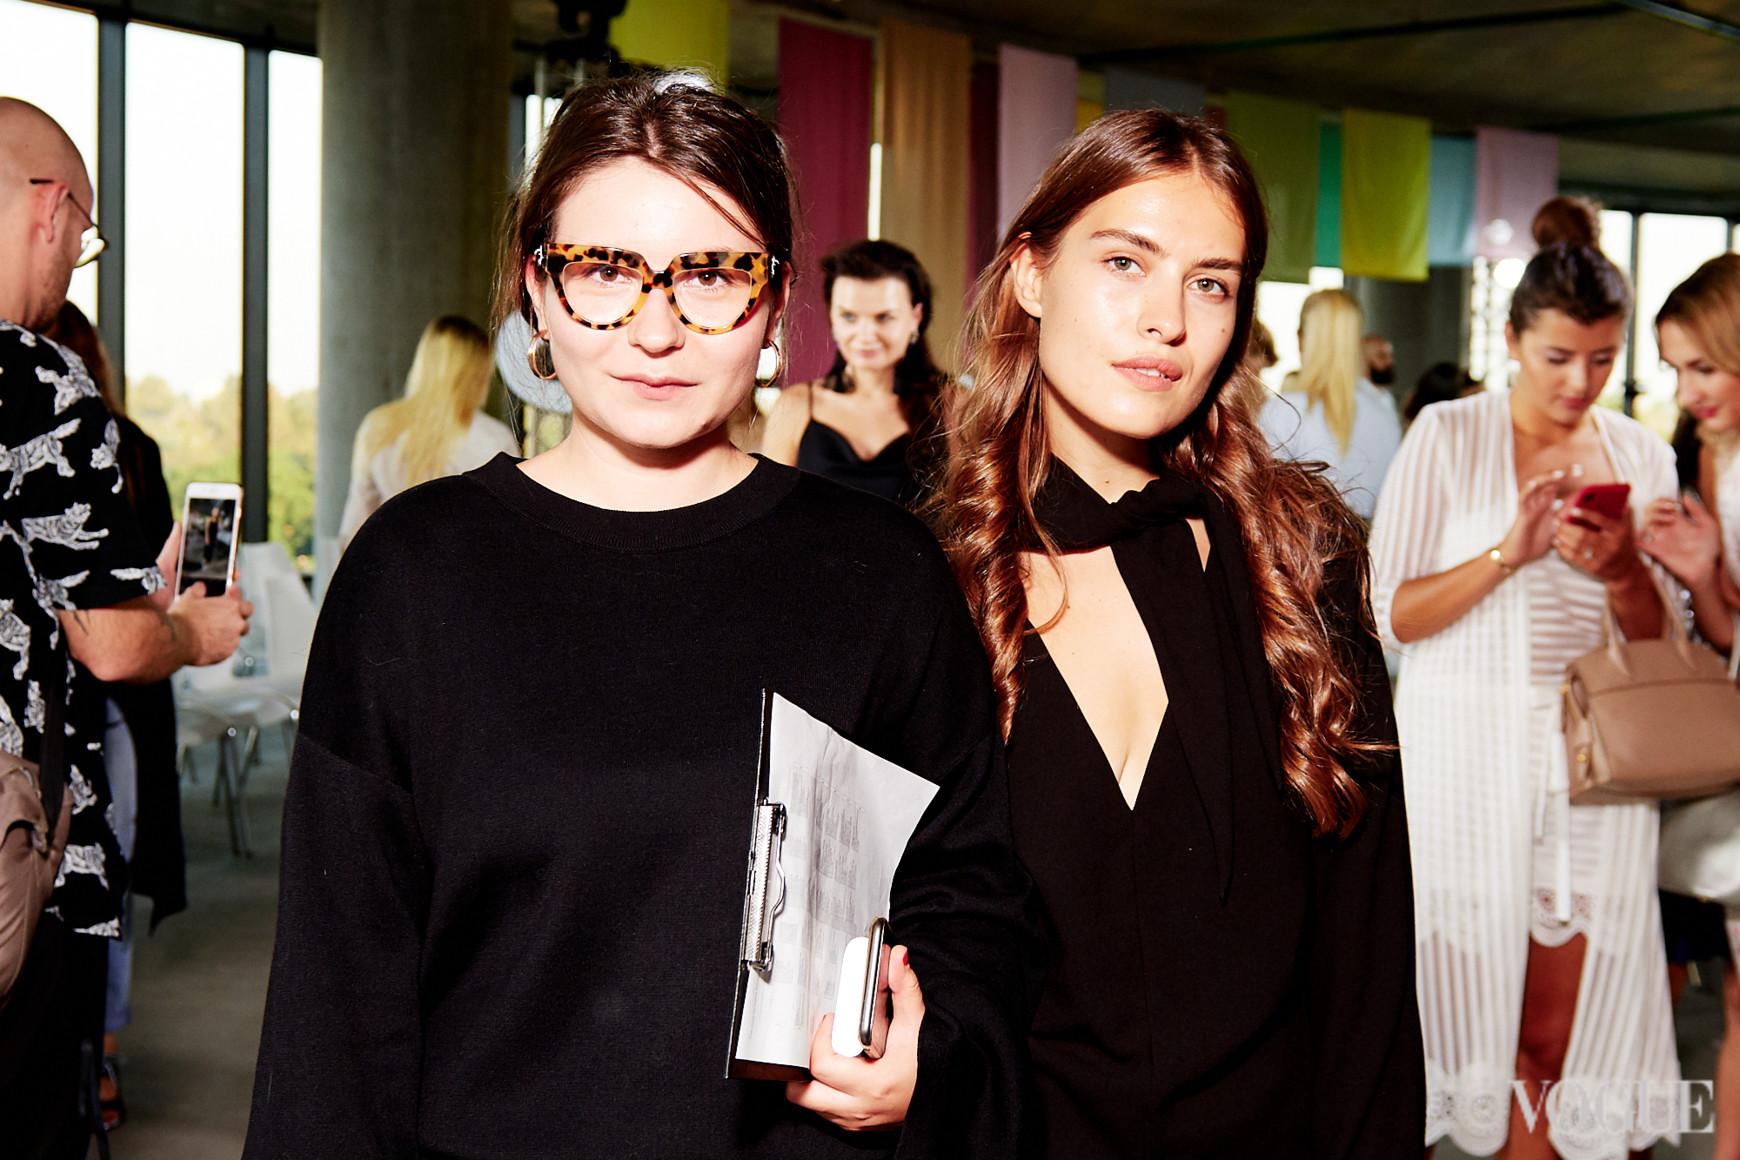 Анастасия Ивченко и Евгения Скибина